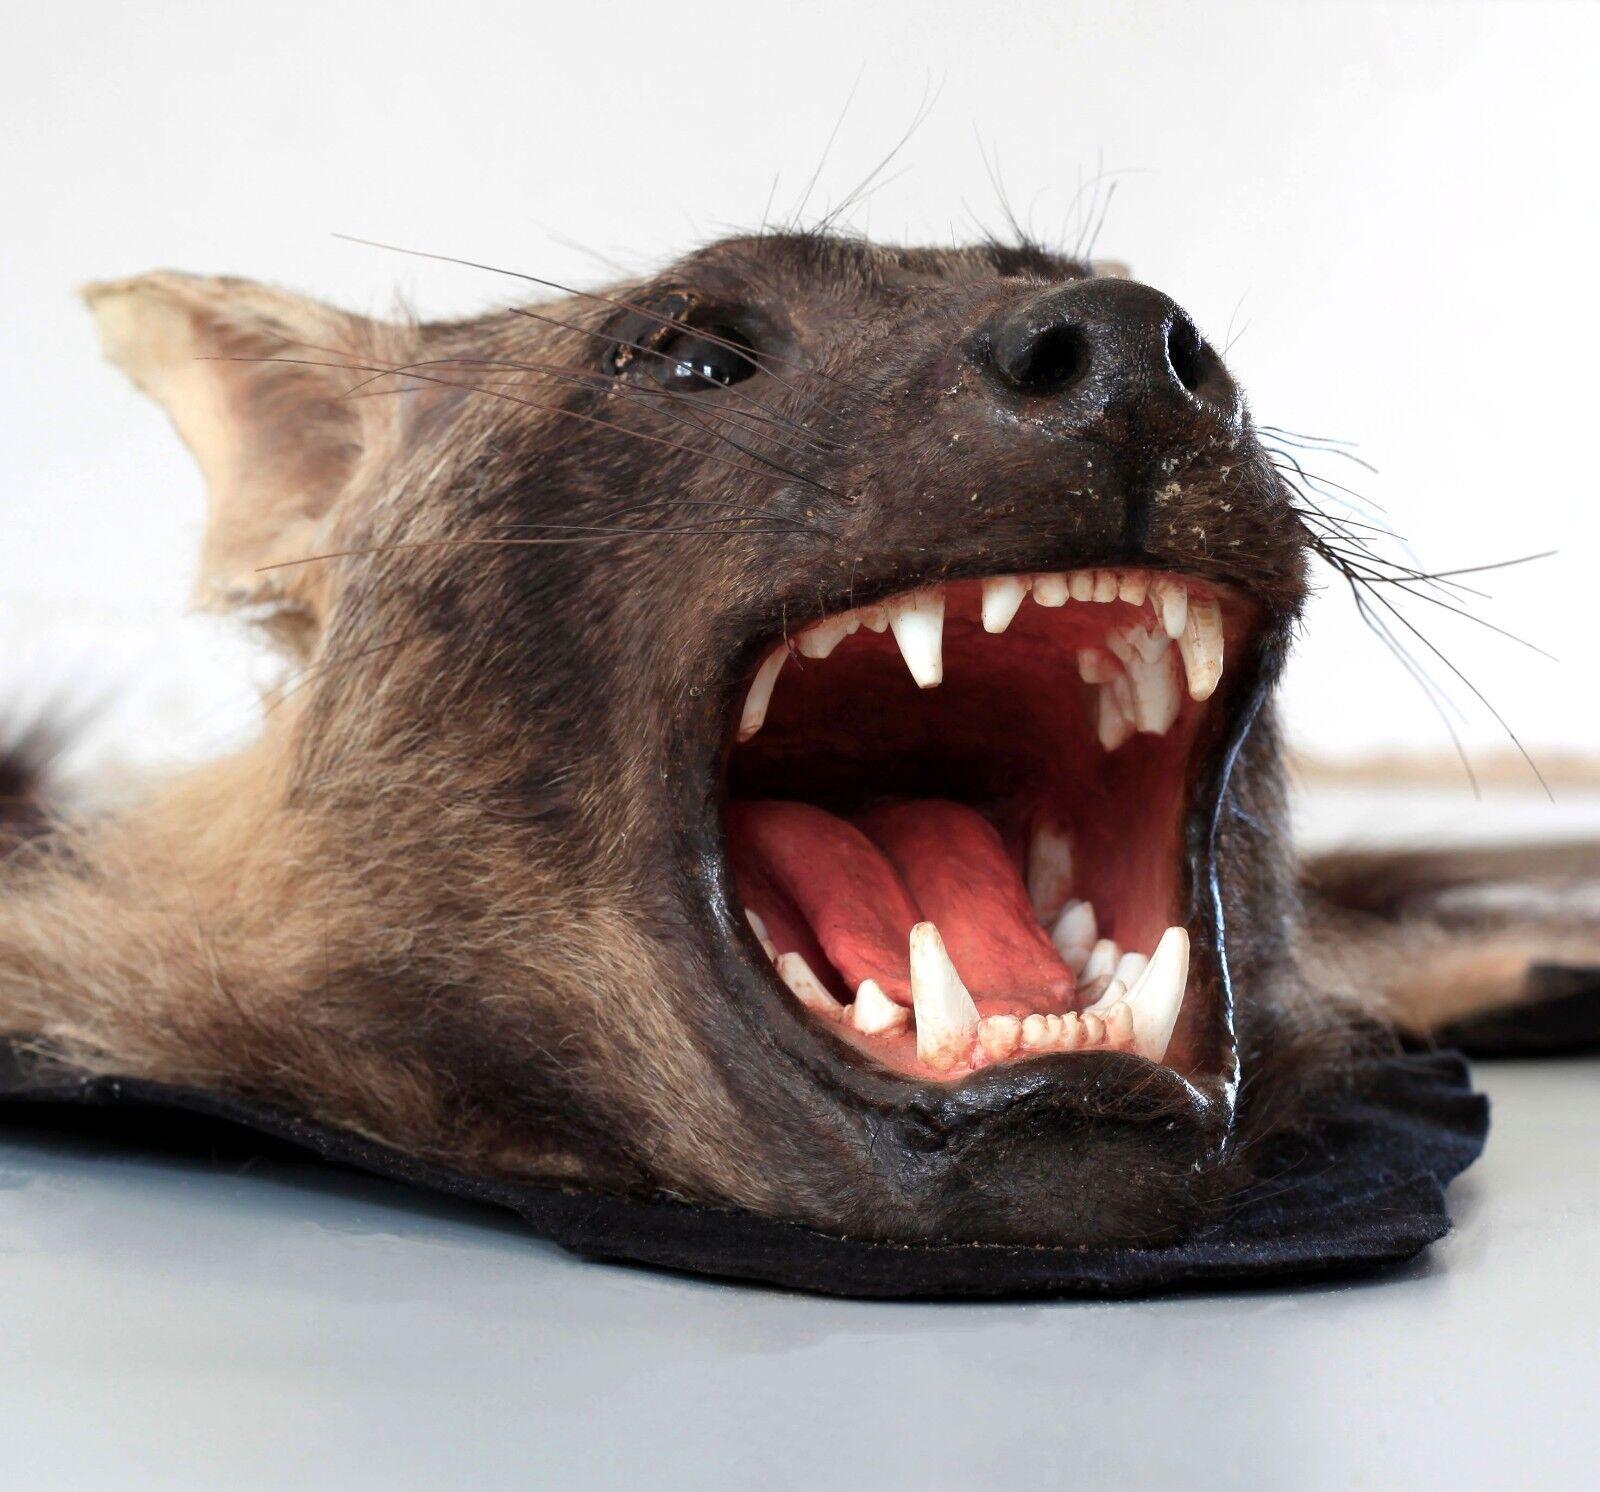 Tierpr parat, Véritable Marron Hyène, Brown hyaena, hyènes hyènes hyaena, Tapis, Fourrure Tapis fce009